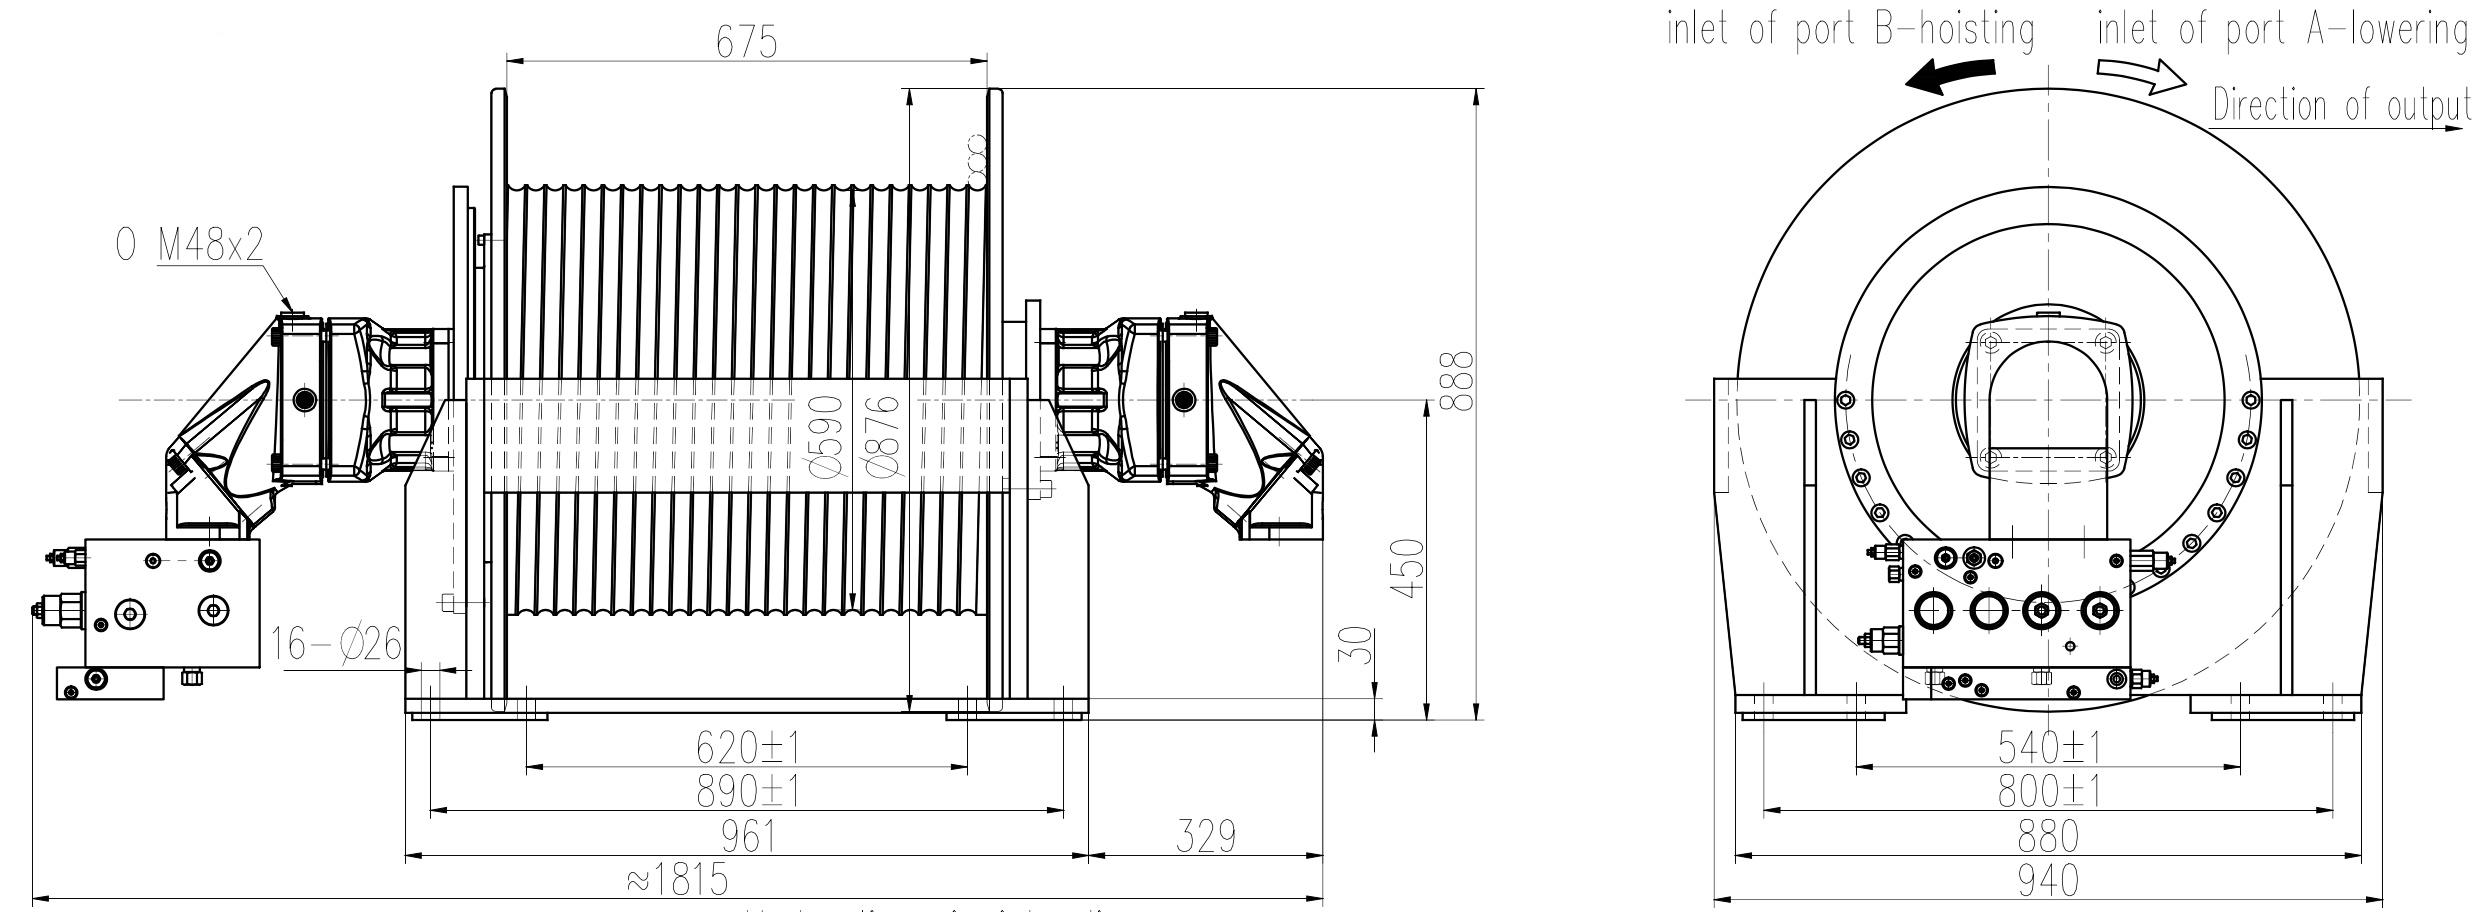 dual motor winch configuration